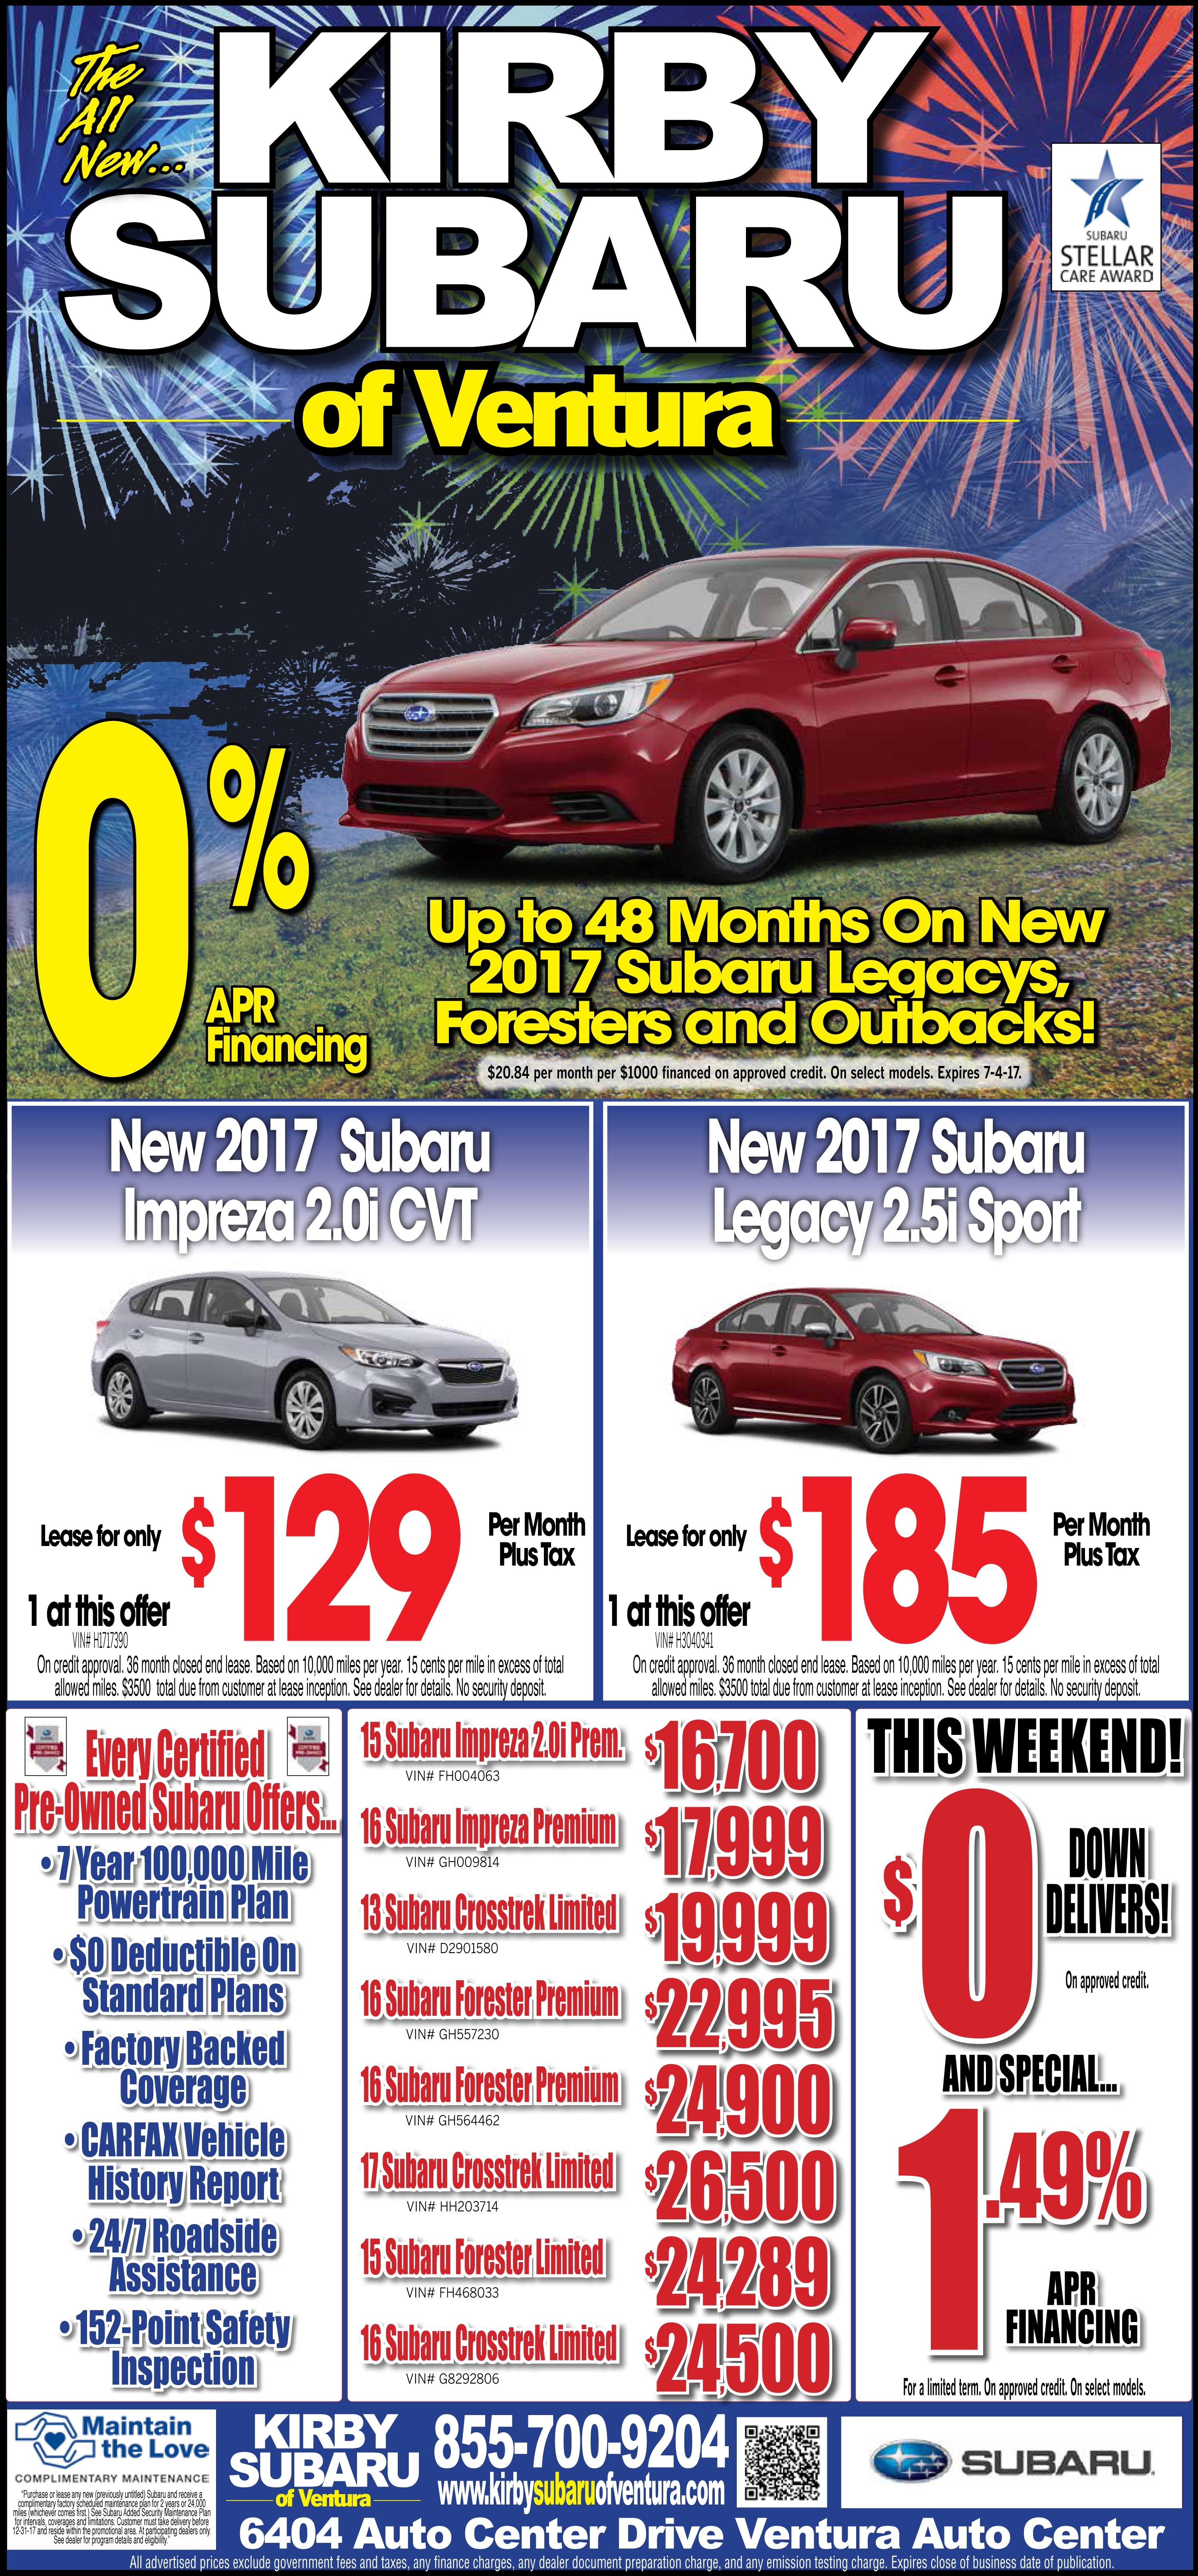 Weekend Subaru Specials at Kirby Subaru of Ventura